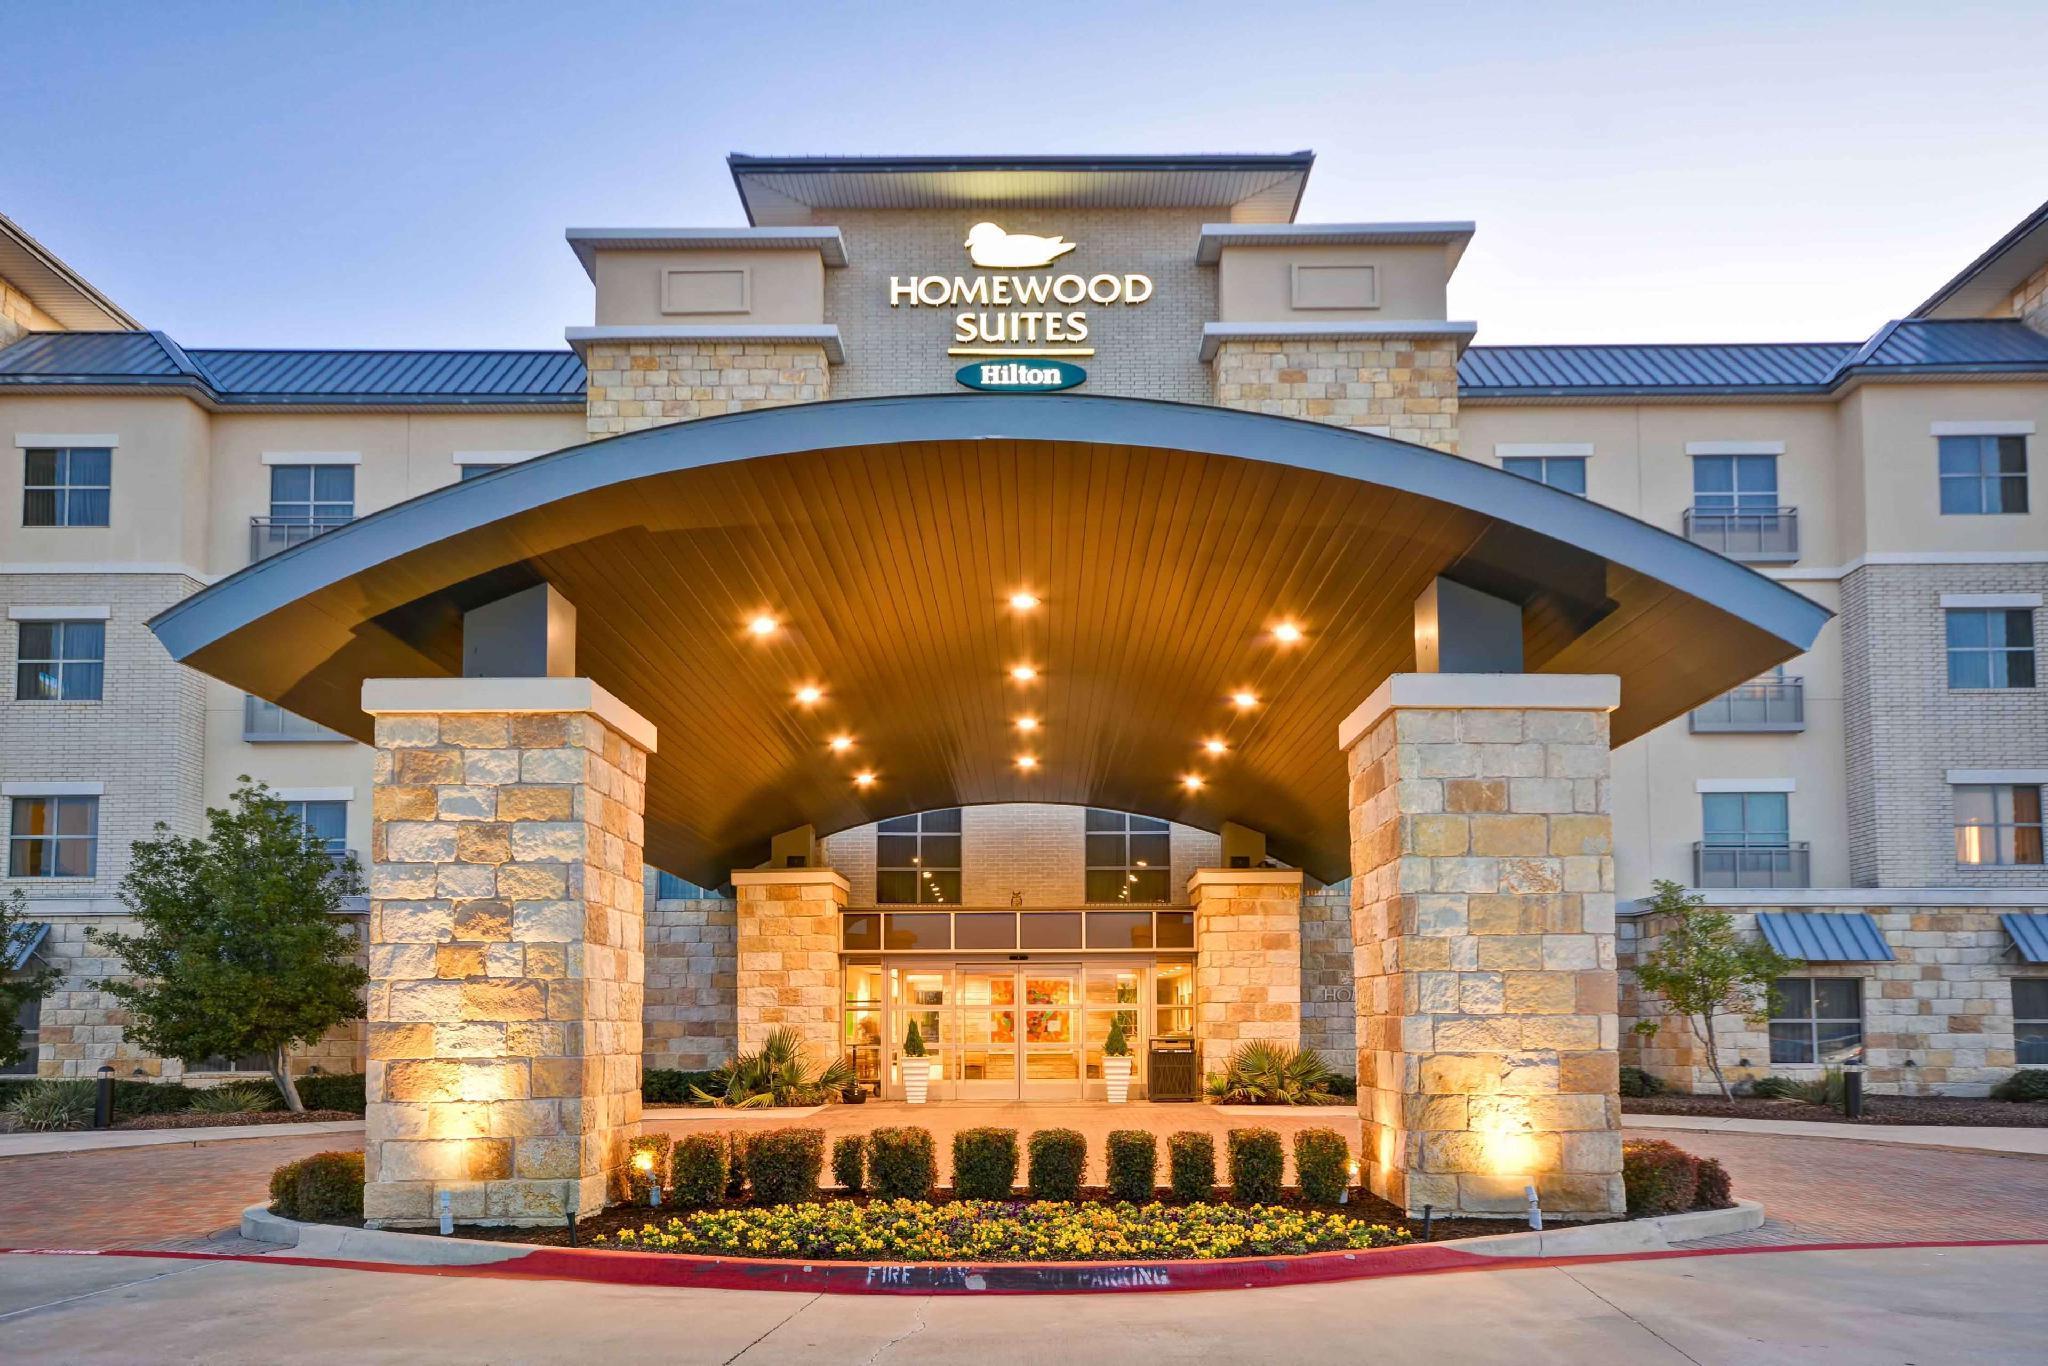 Homewood Suites By Hilton Dallas Frisco